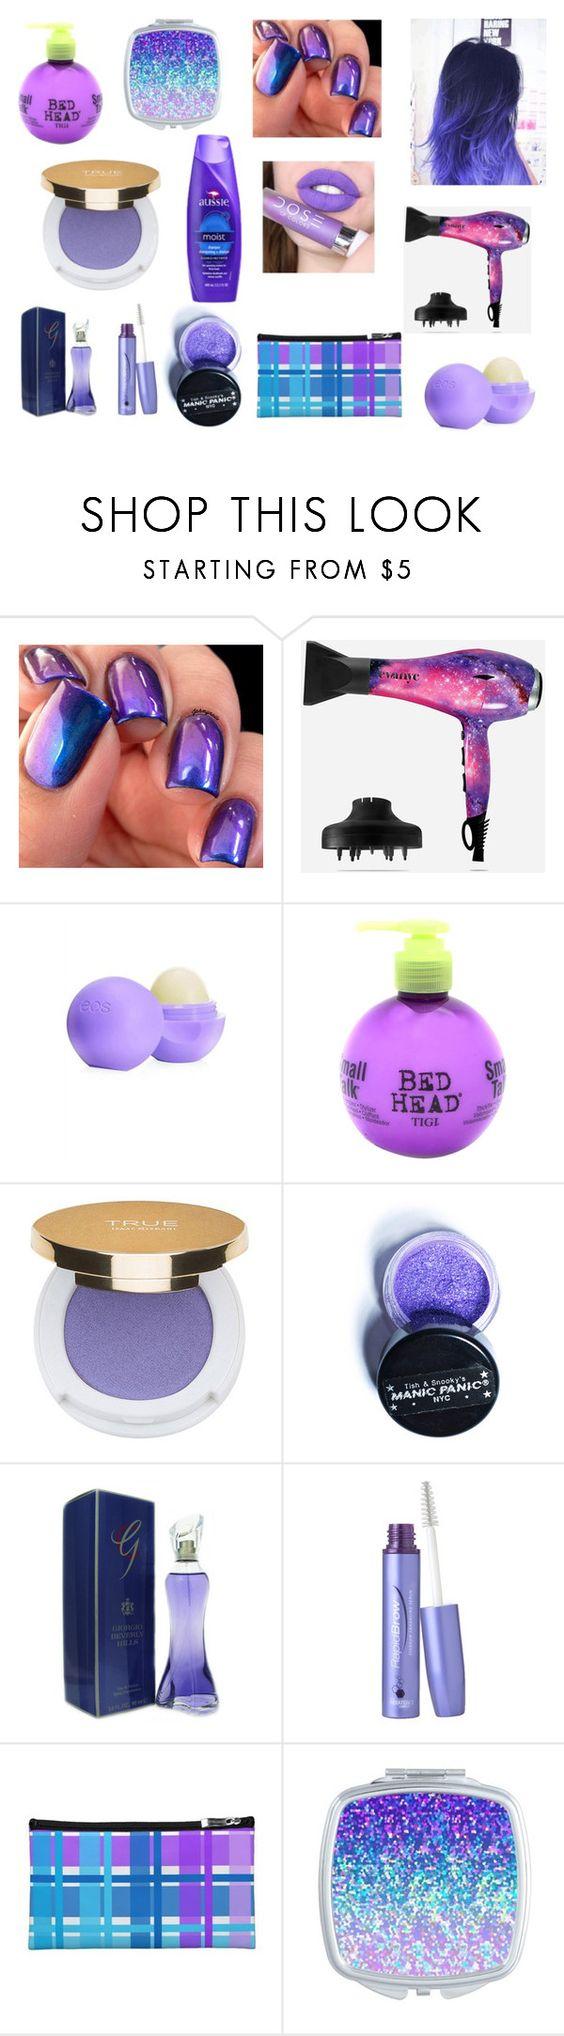 """Purple Makeup"" by nmekonnen28 on Polyvore featuring beauty, Eva NYC, Eos, Bed Head by TIGI, Isaac Mizrahi, Manic Panic, Giorgio Beverly Hills and RapidLash"